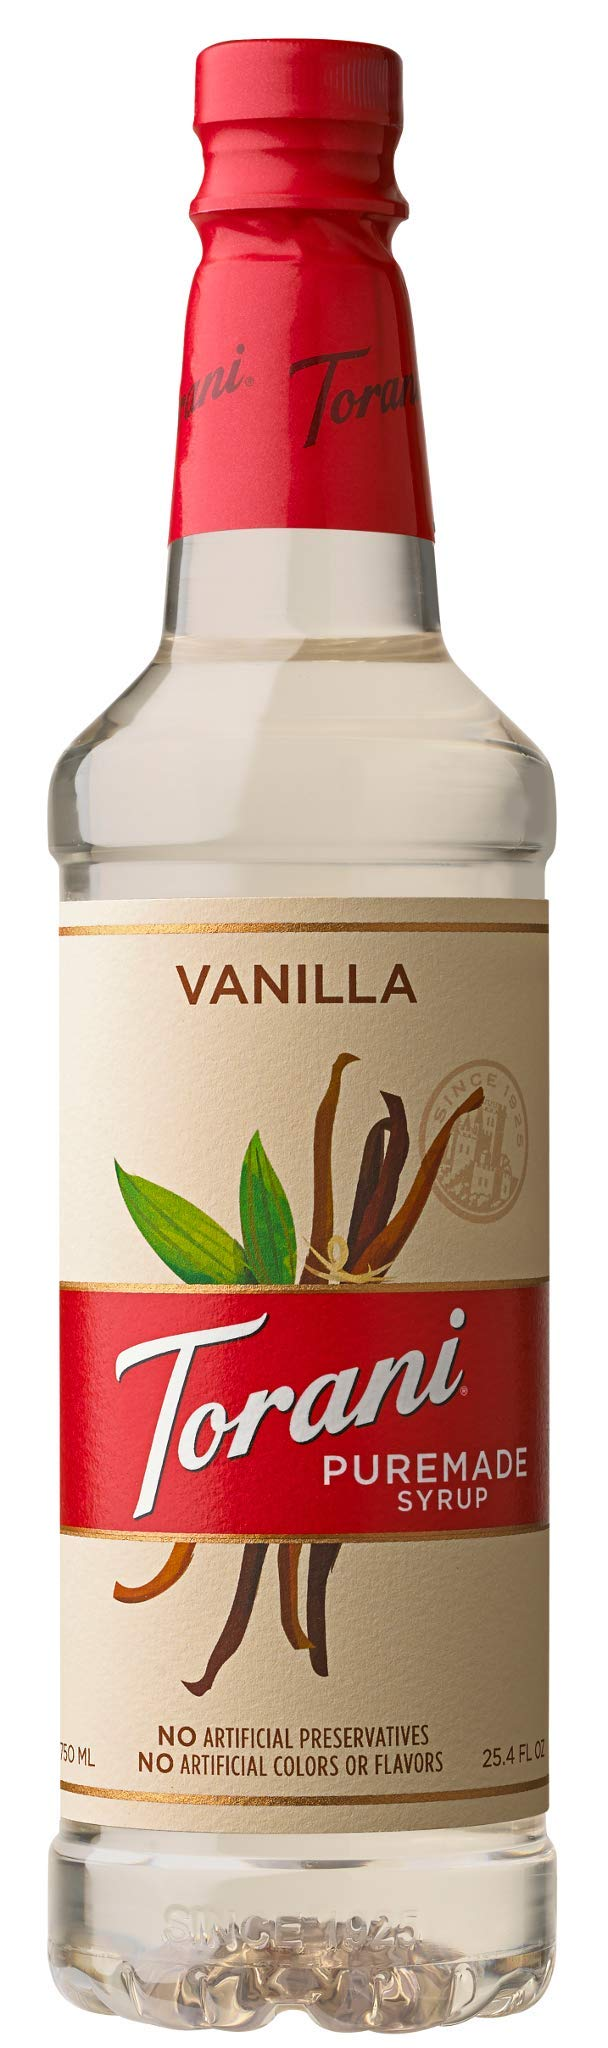 Torani Puremade Vanilla Syrup, 750 mL